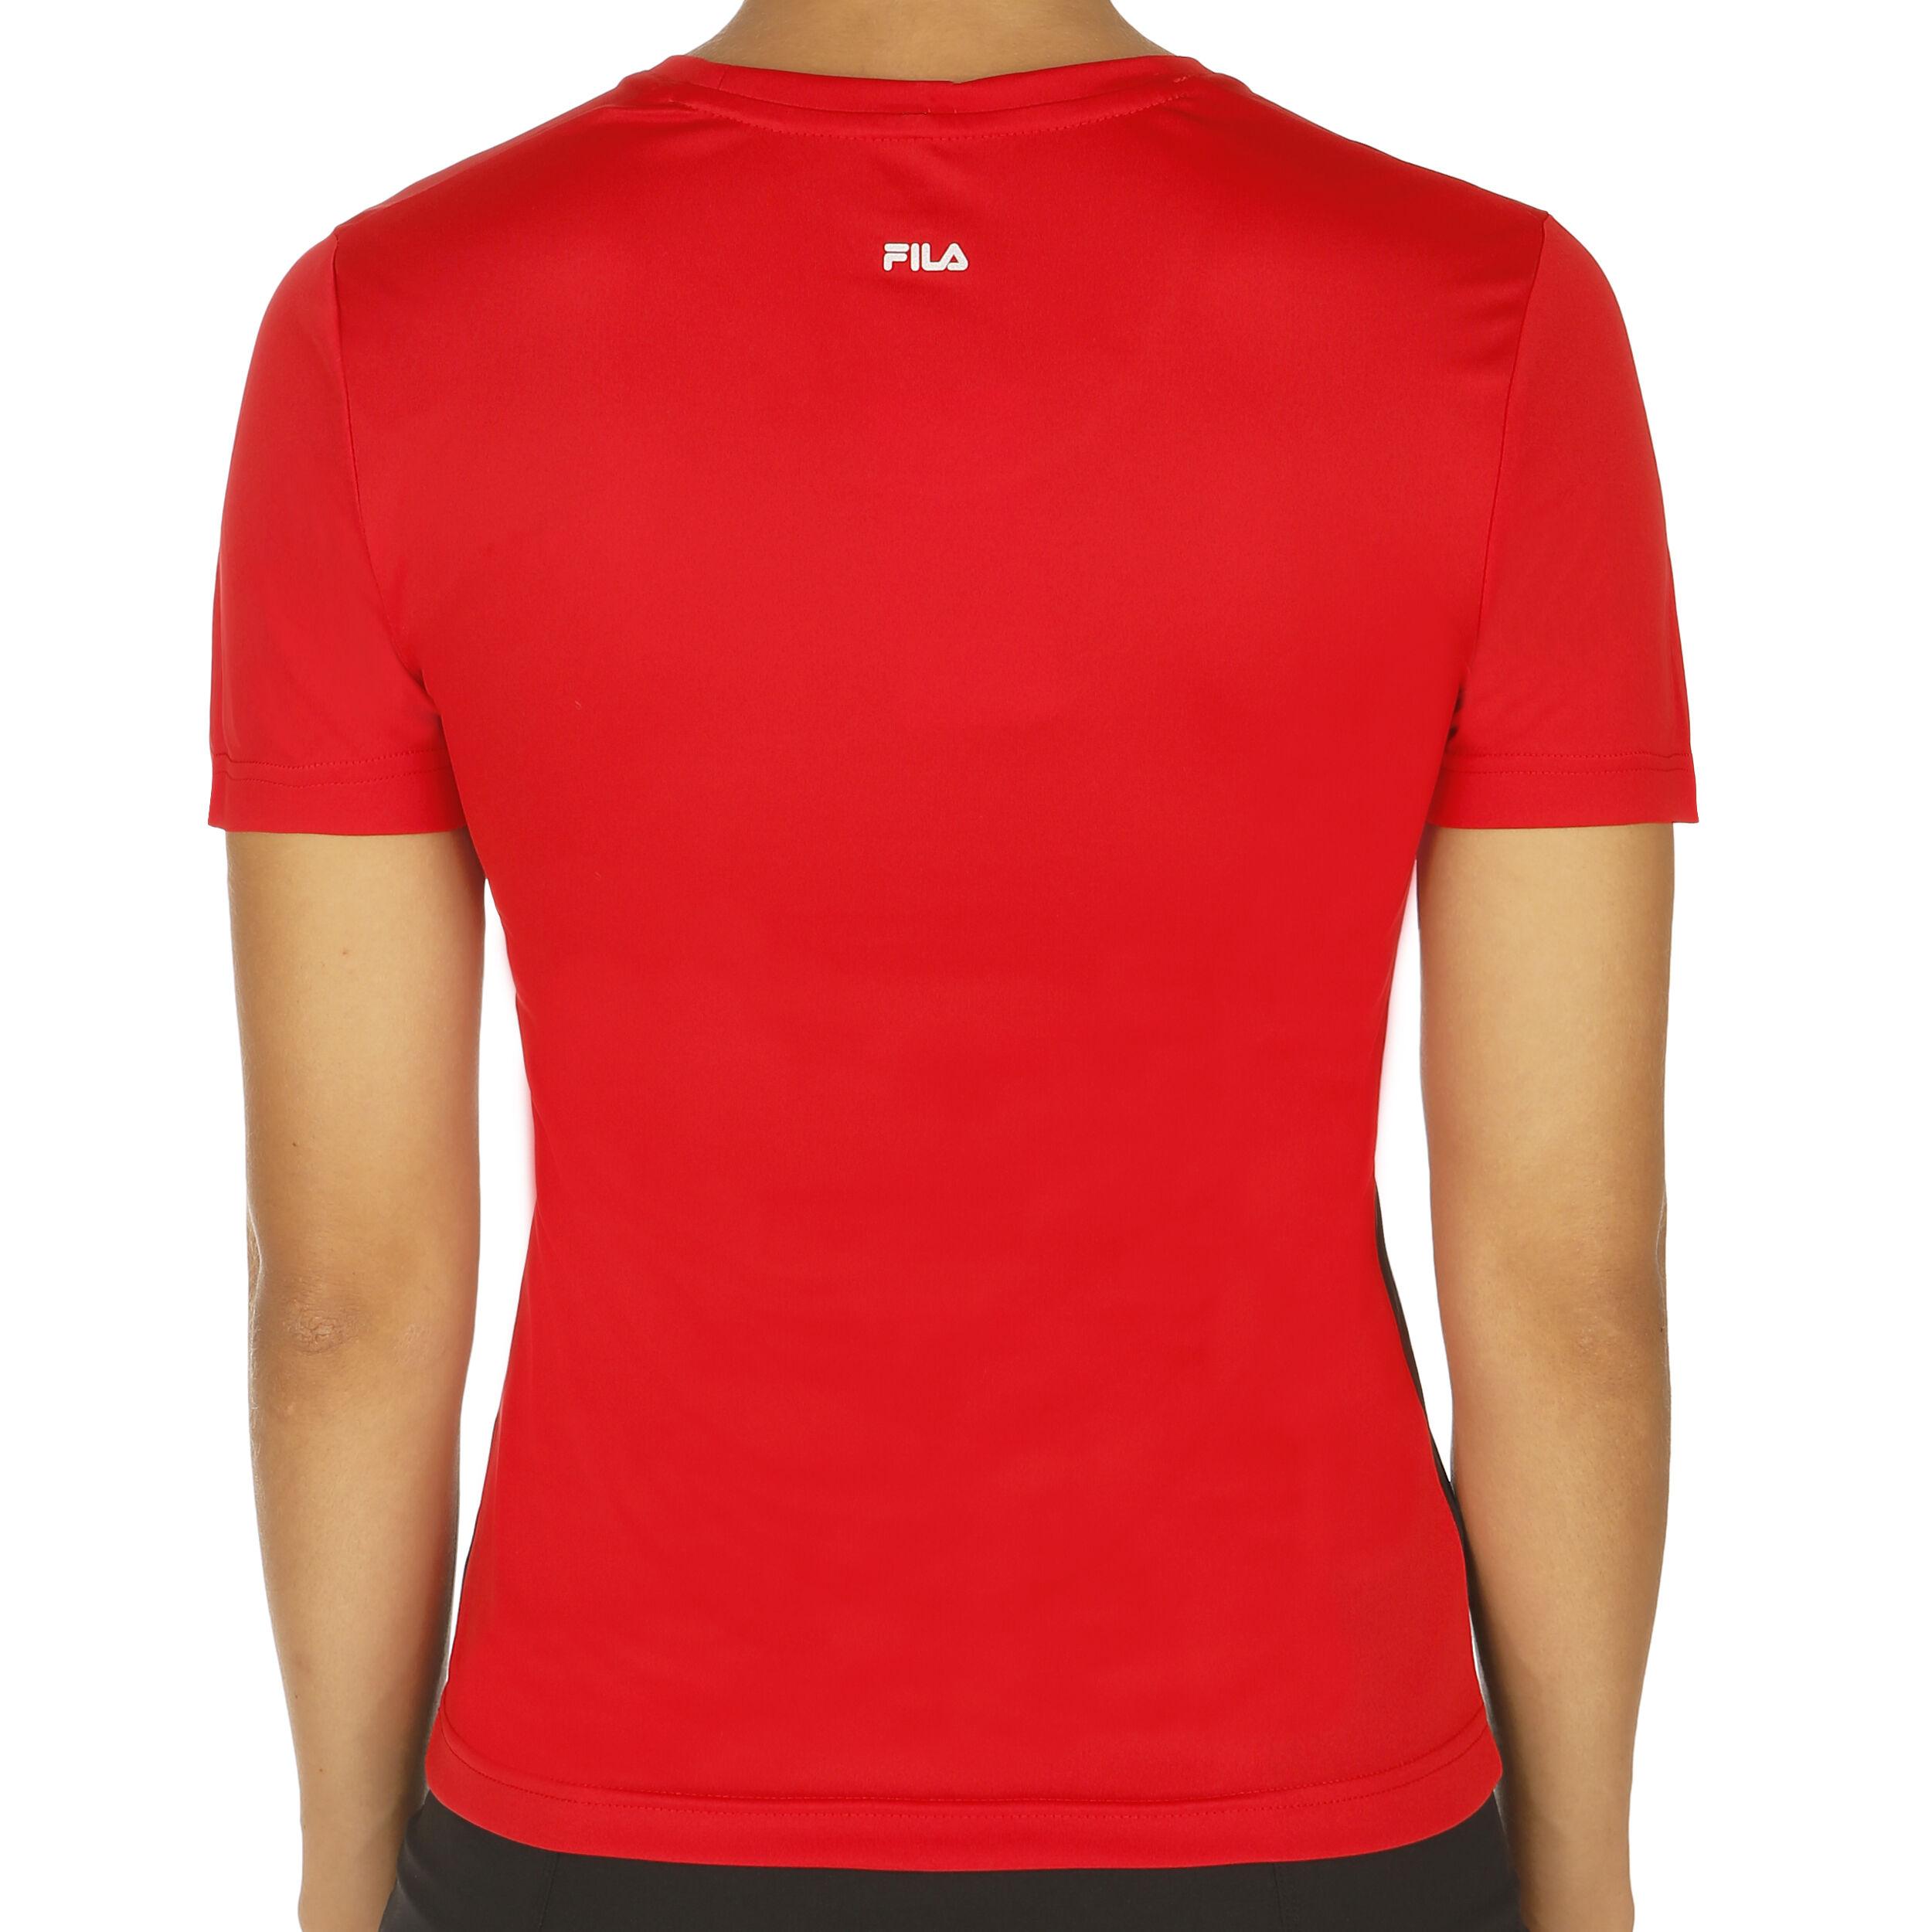 Fila Saya T shirt Dames Rood, Wit online kopen | Tennis Point